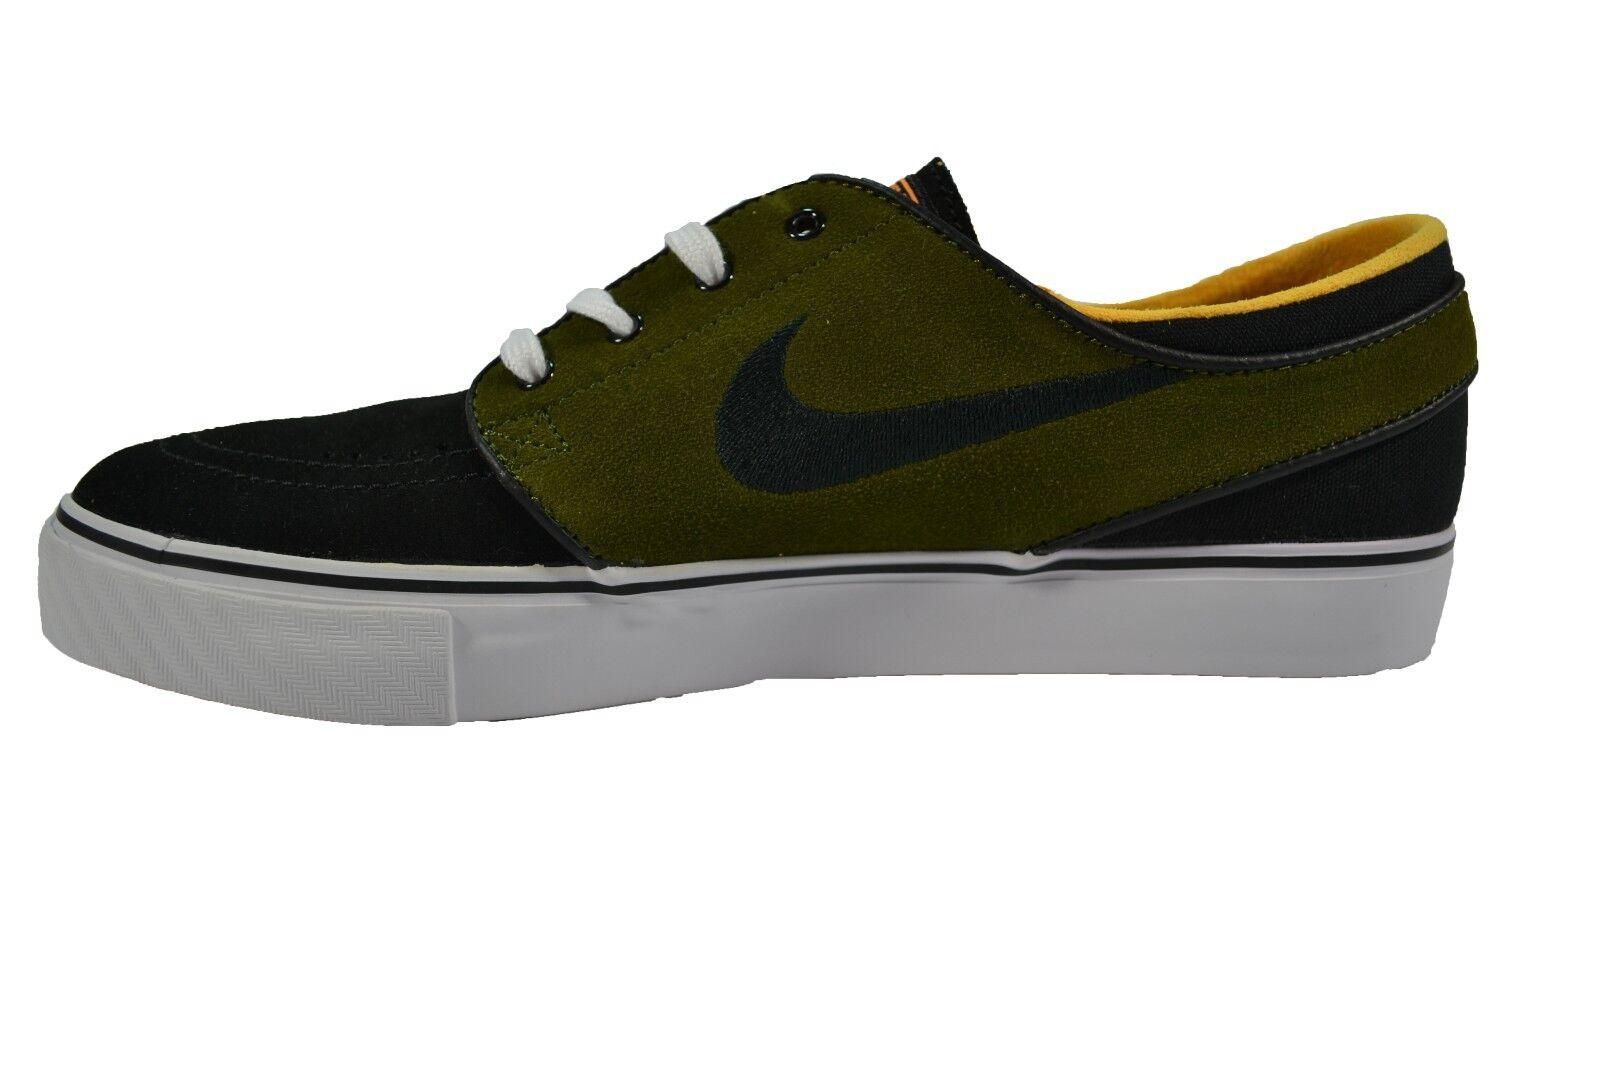 Nike zoom stefan janoski schwarze legion grünen laser - - - orange (335) männer, schuhe a3a828